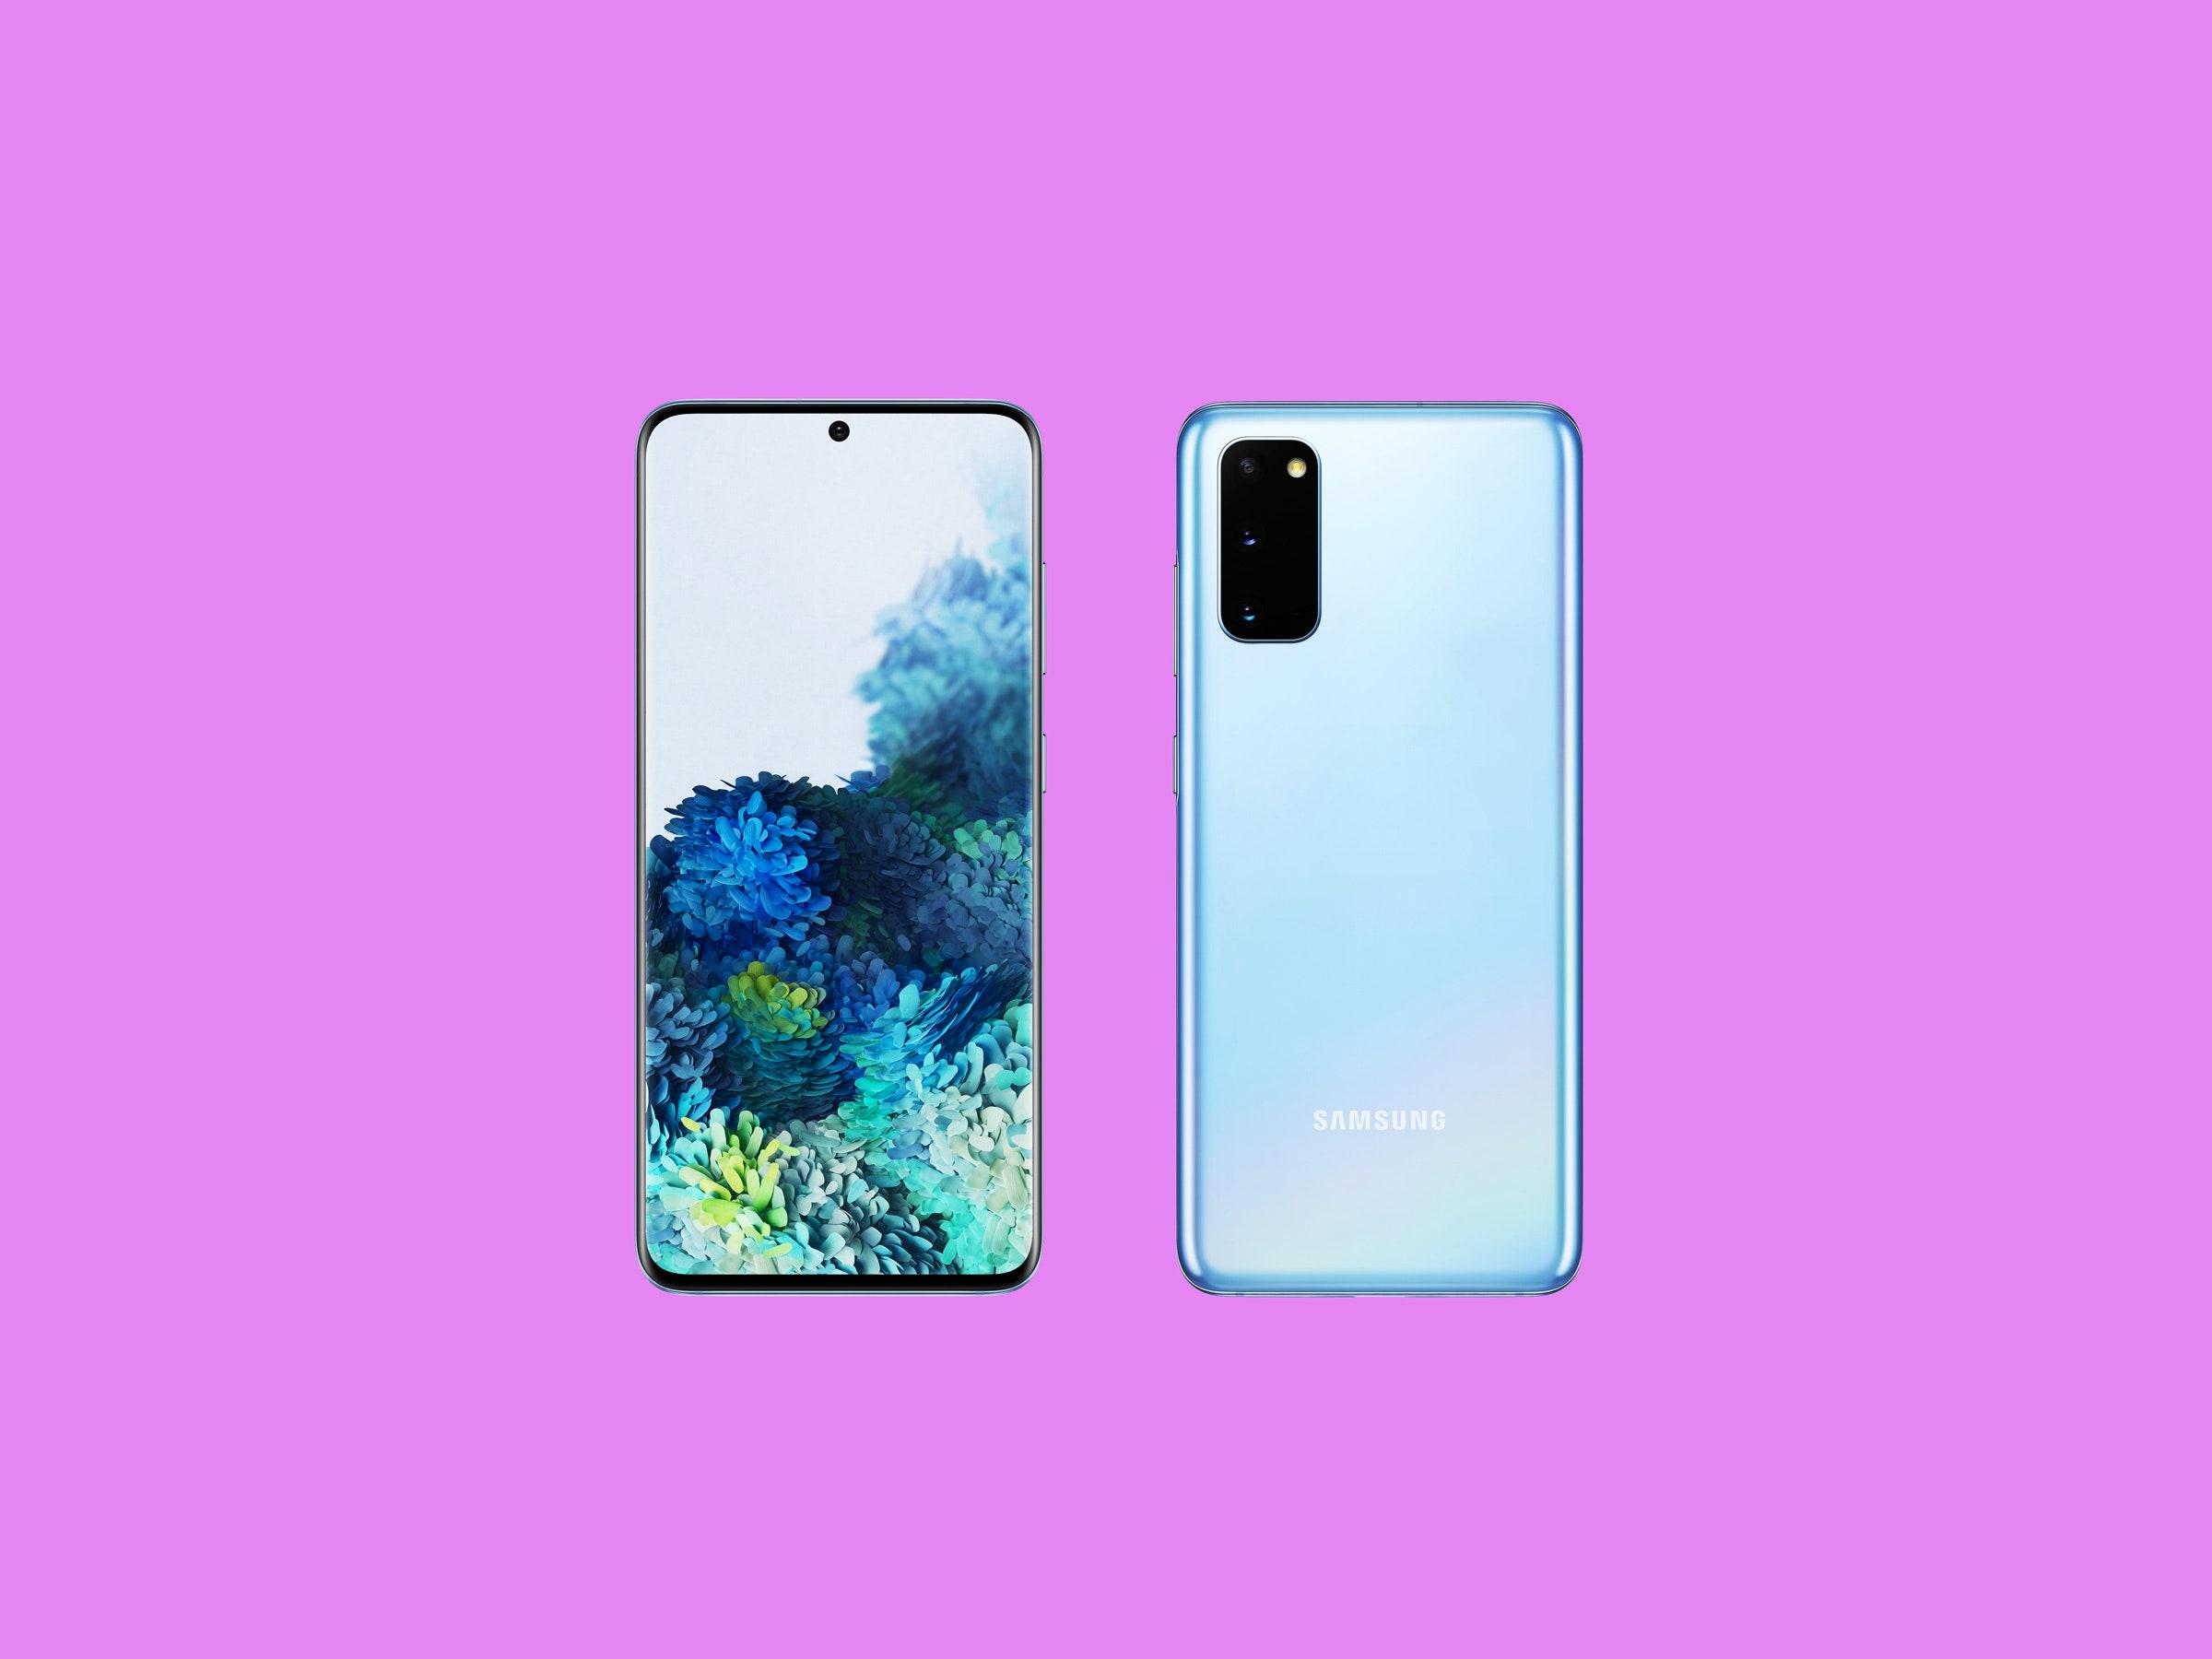 Samsung Galaxy S20 – Design